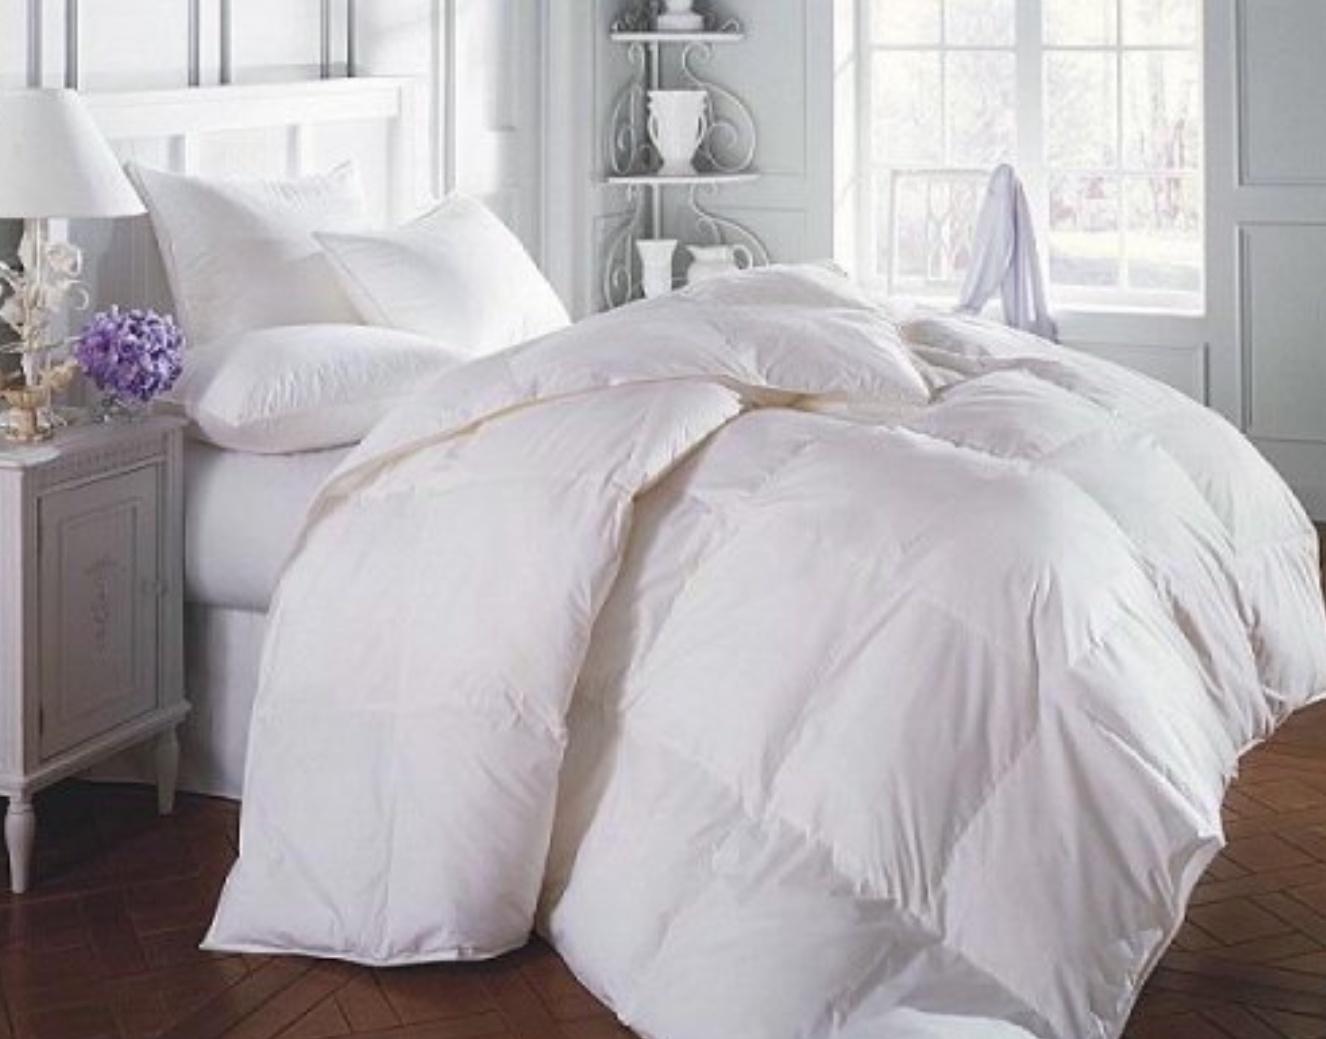 Set complet pentru dormitor: Pilota 2 persoane puf siliconat + 2 perne 50 x 70 cm